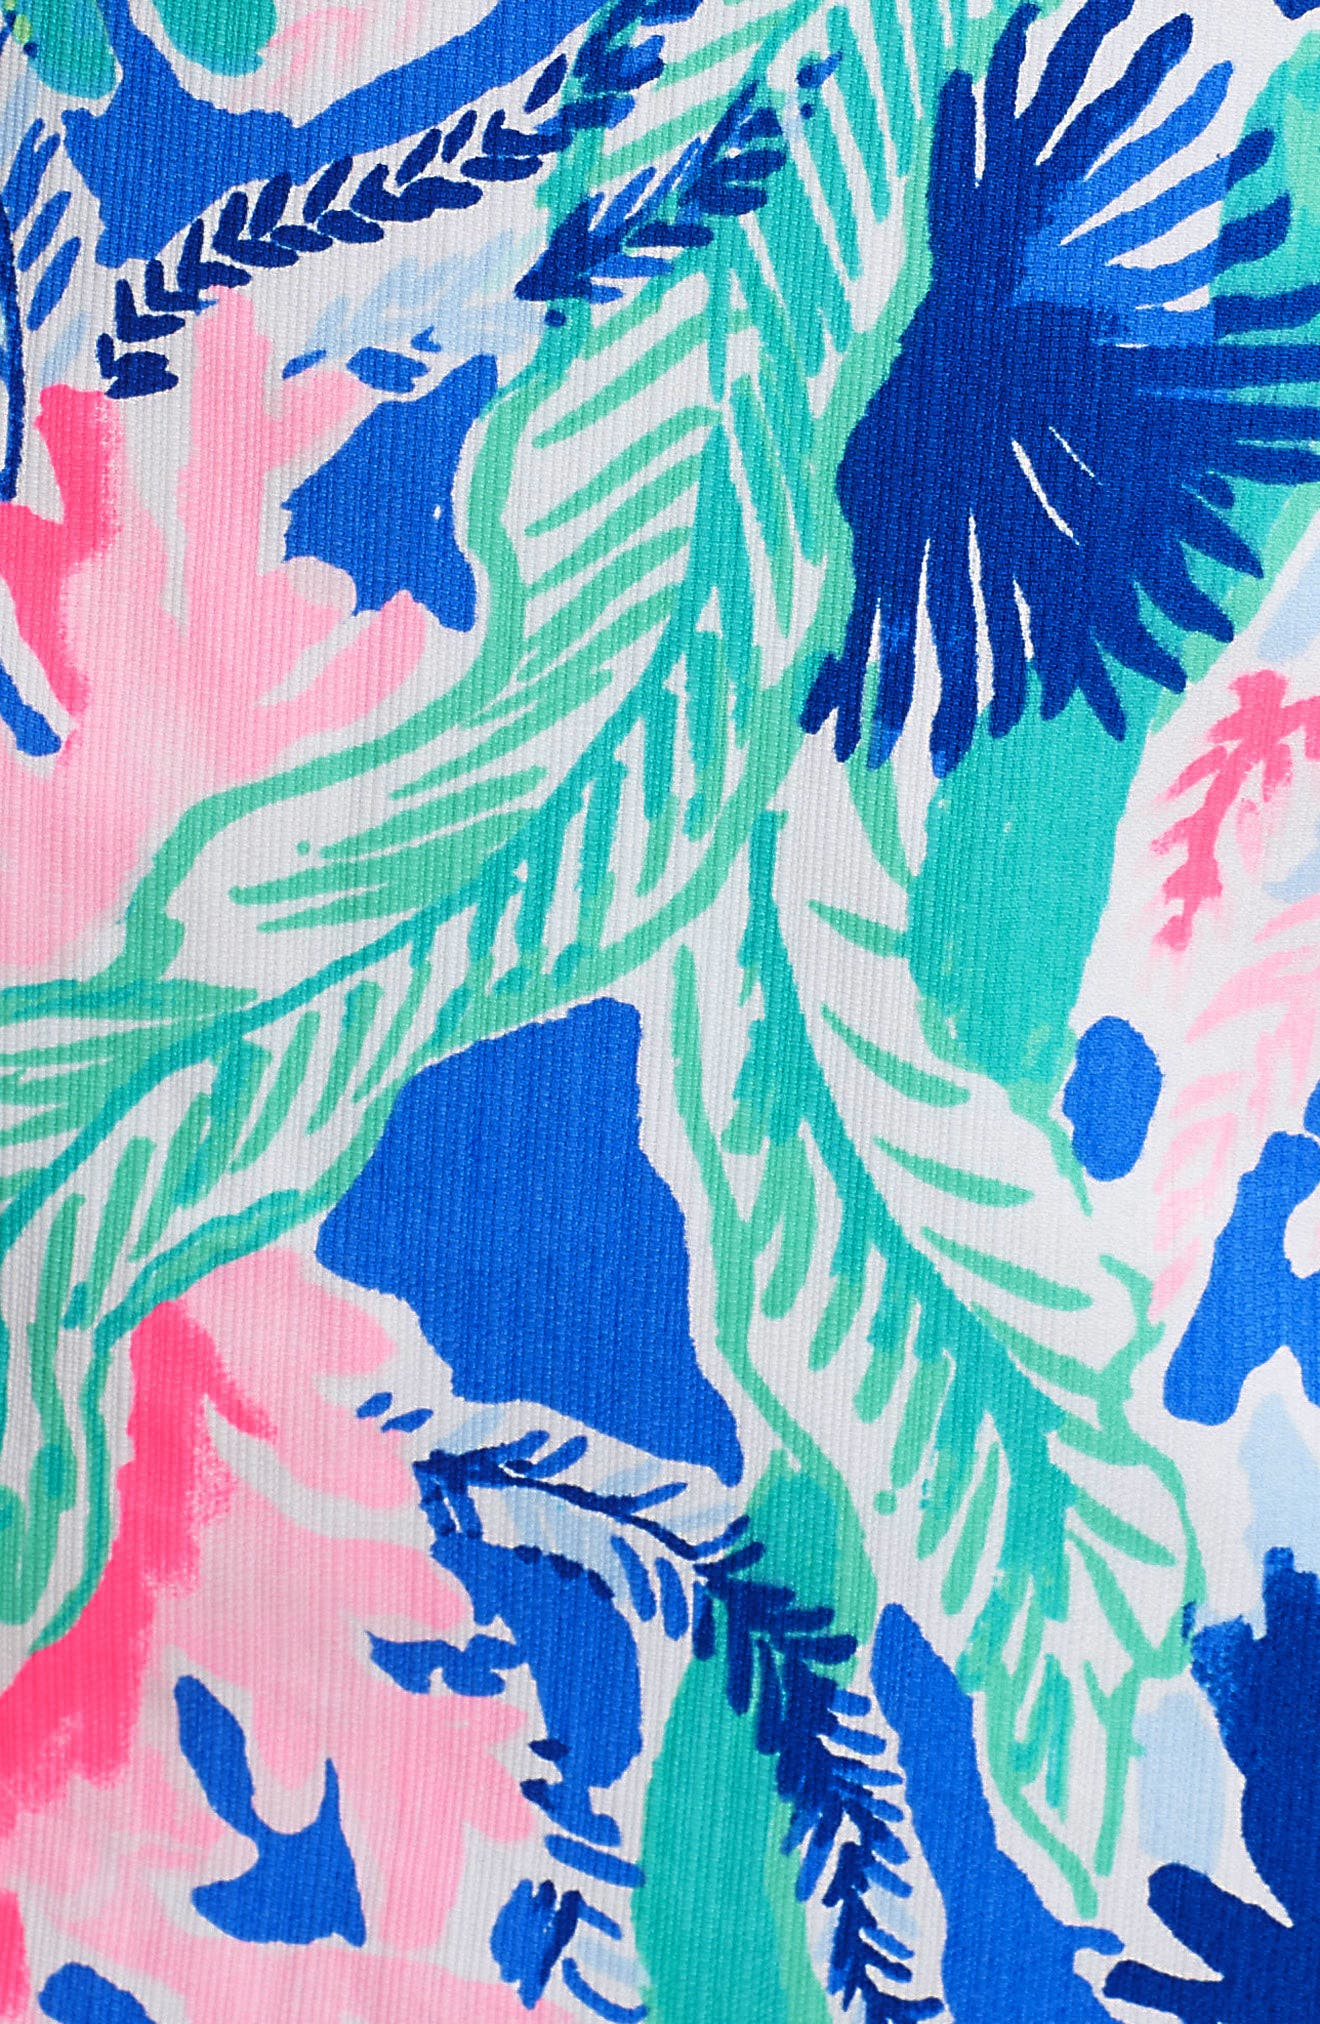 Gabby Sheath Dress,                             Alternate thumbnail 6, color,                             400